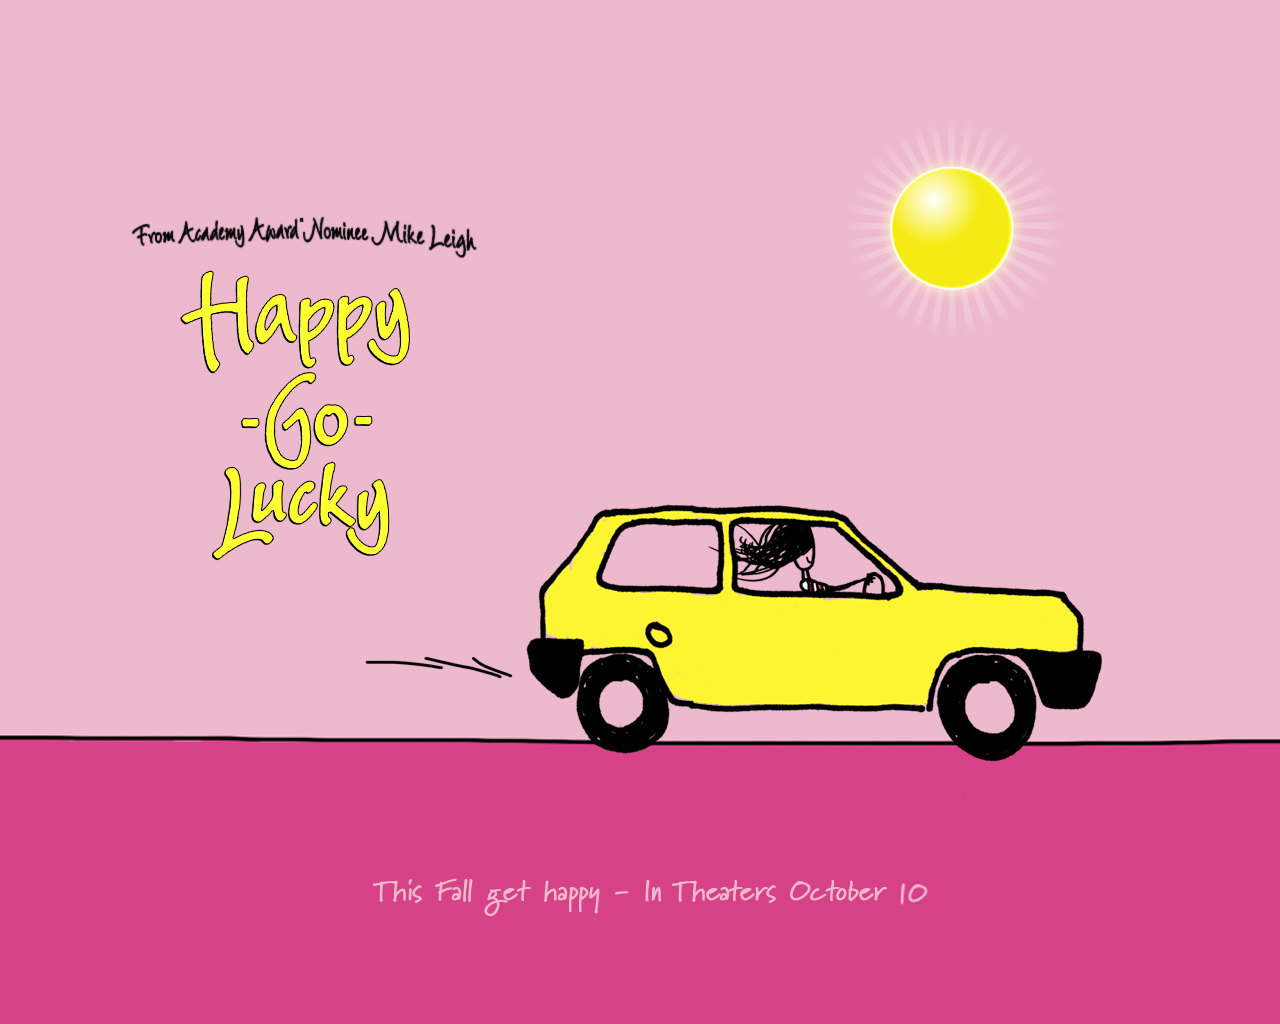 http://1.bp.blogspot.com/-725aQe4XOVs/UDZLxWGFBAI/AAAAAAAAAn0/v57ep9hy9iE/s1600/Sally_Hawkins_in_Happy_Go_Lucky_Wallpaper_3_1024.jpg